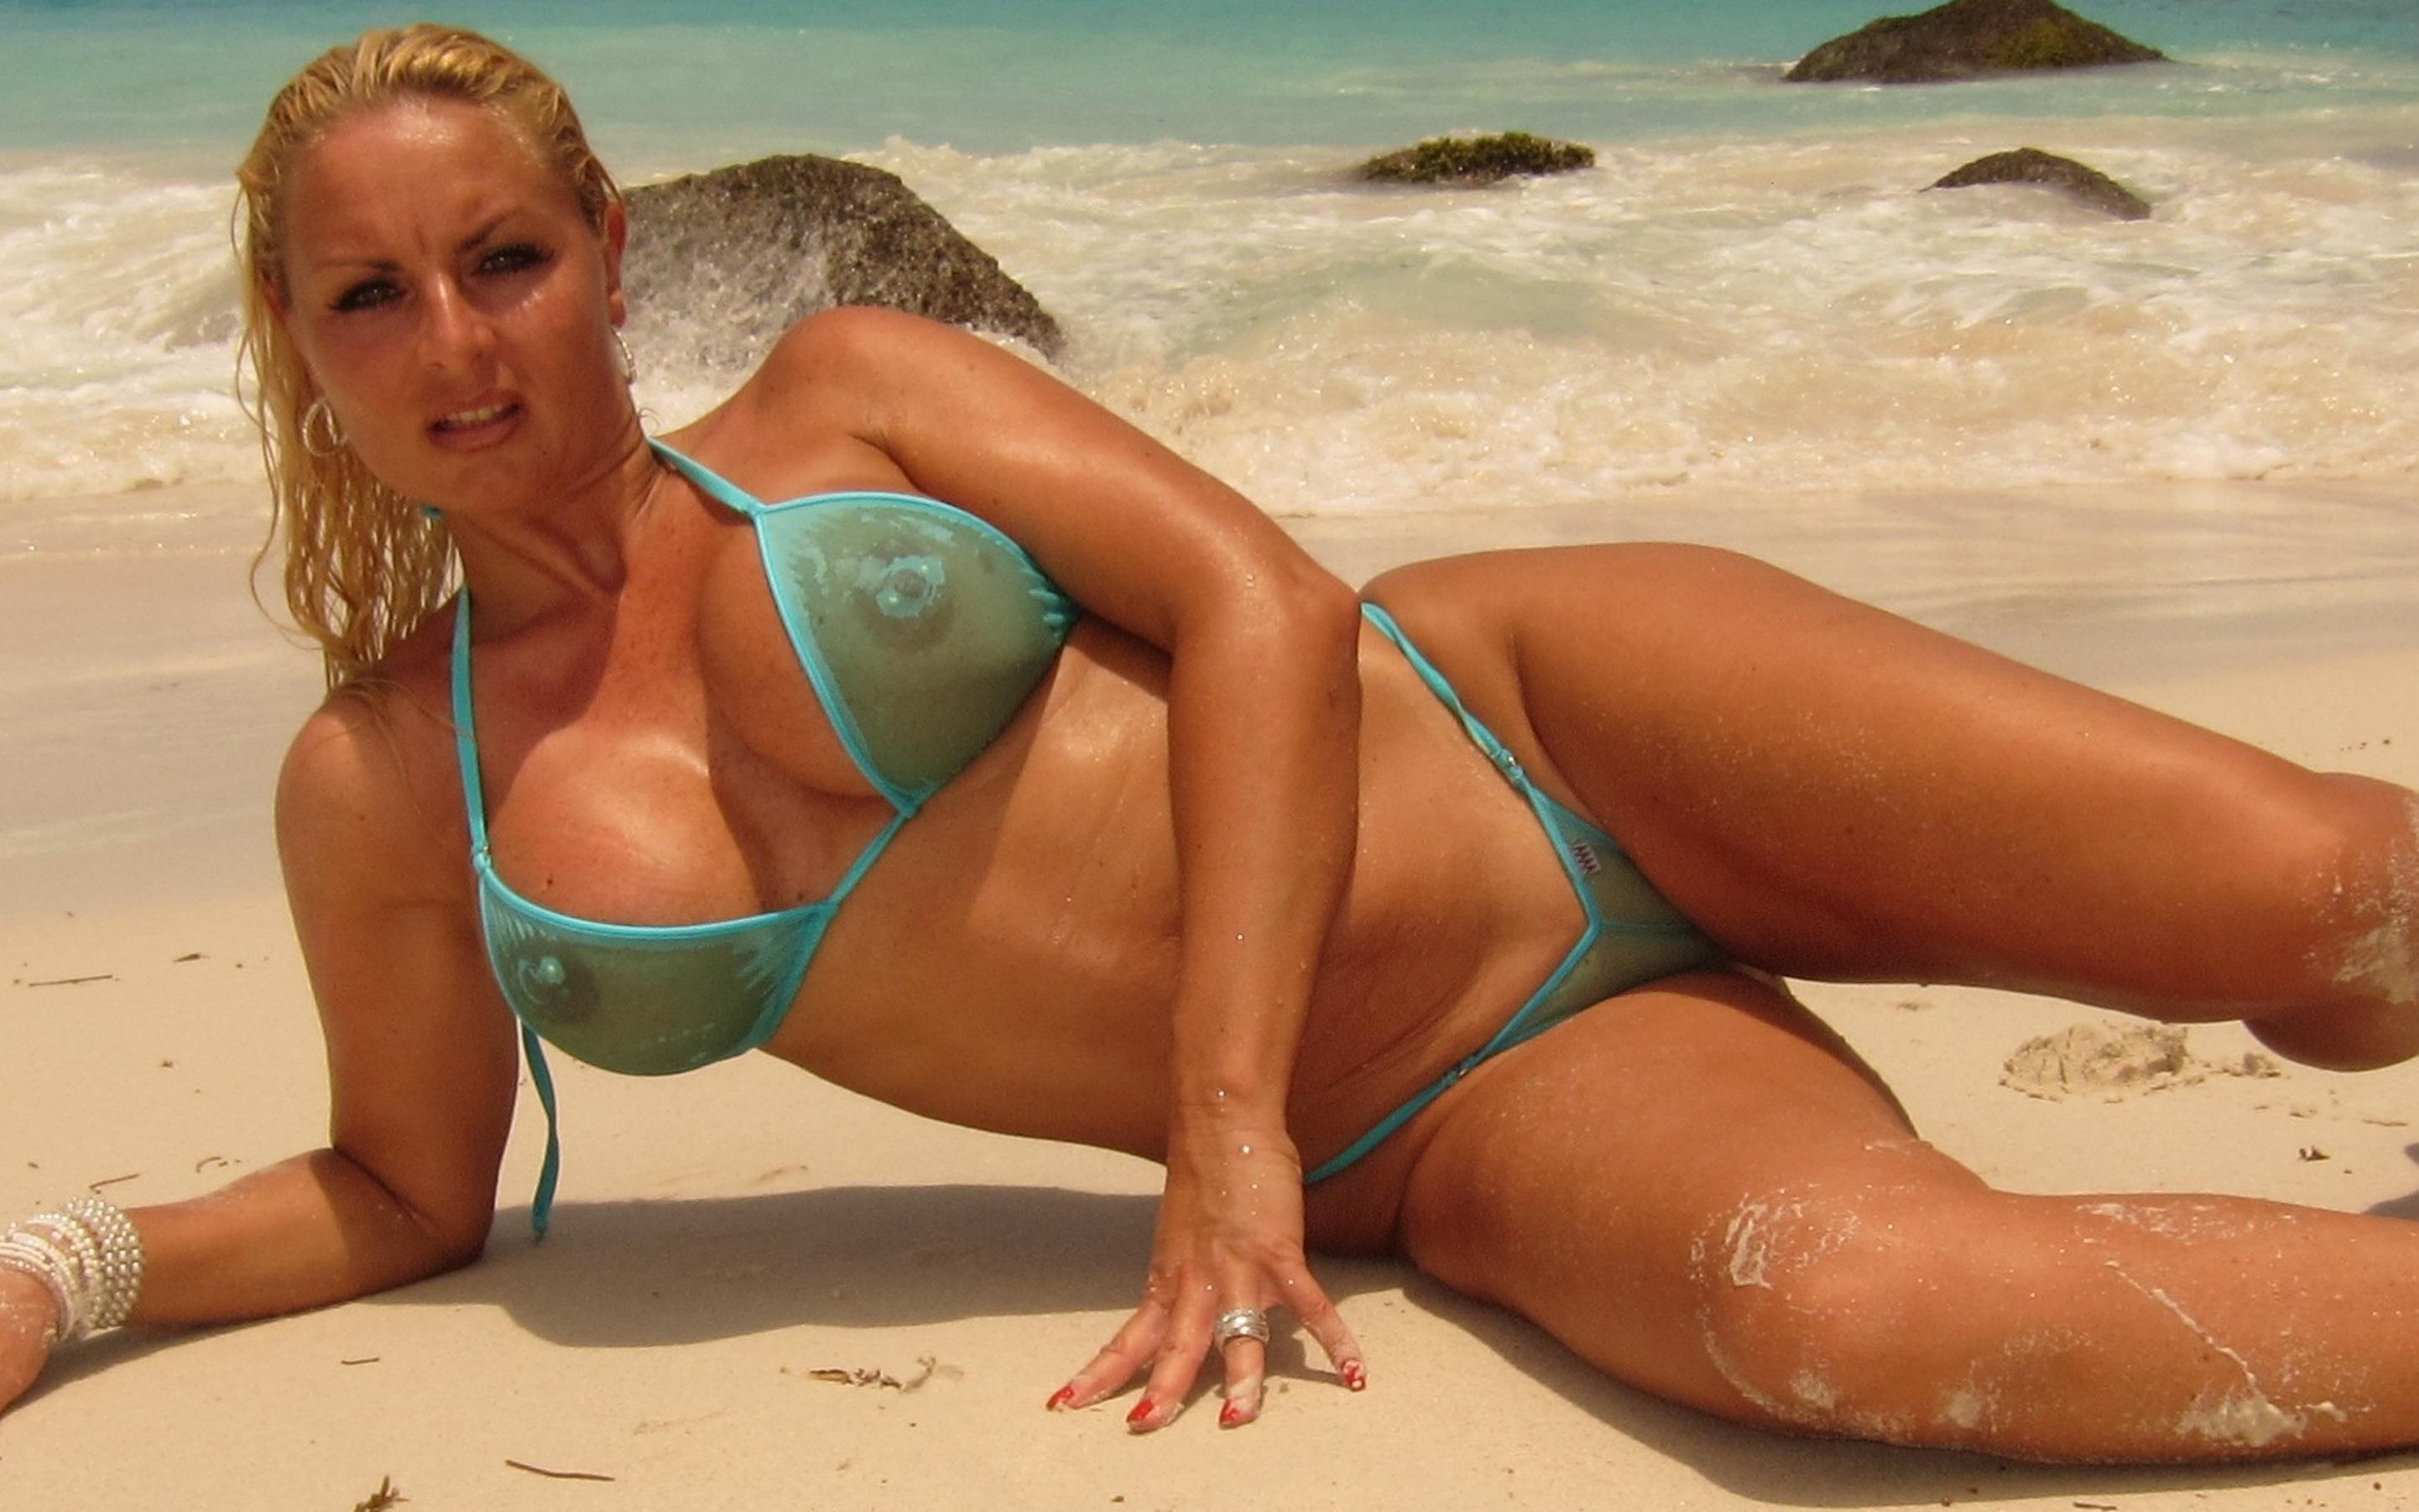 Milf bikini model